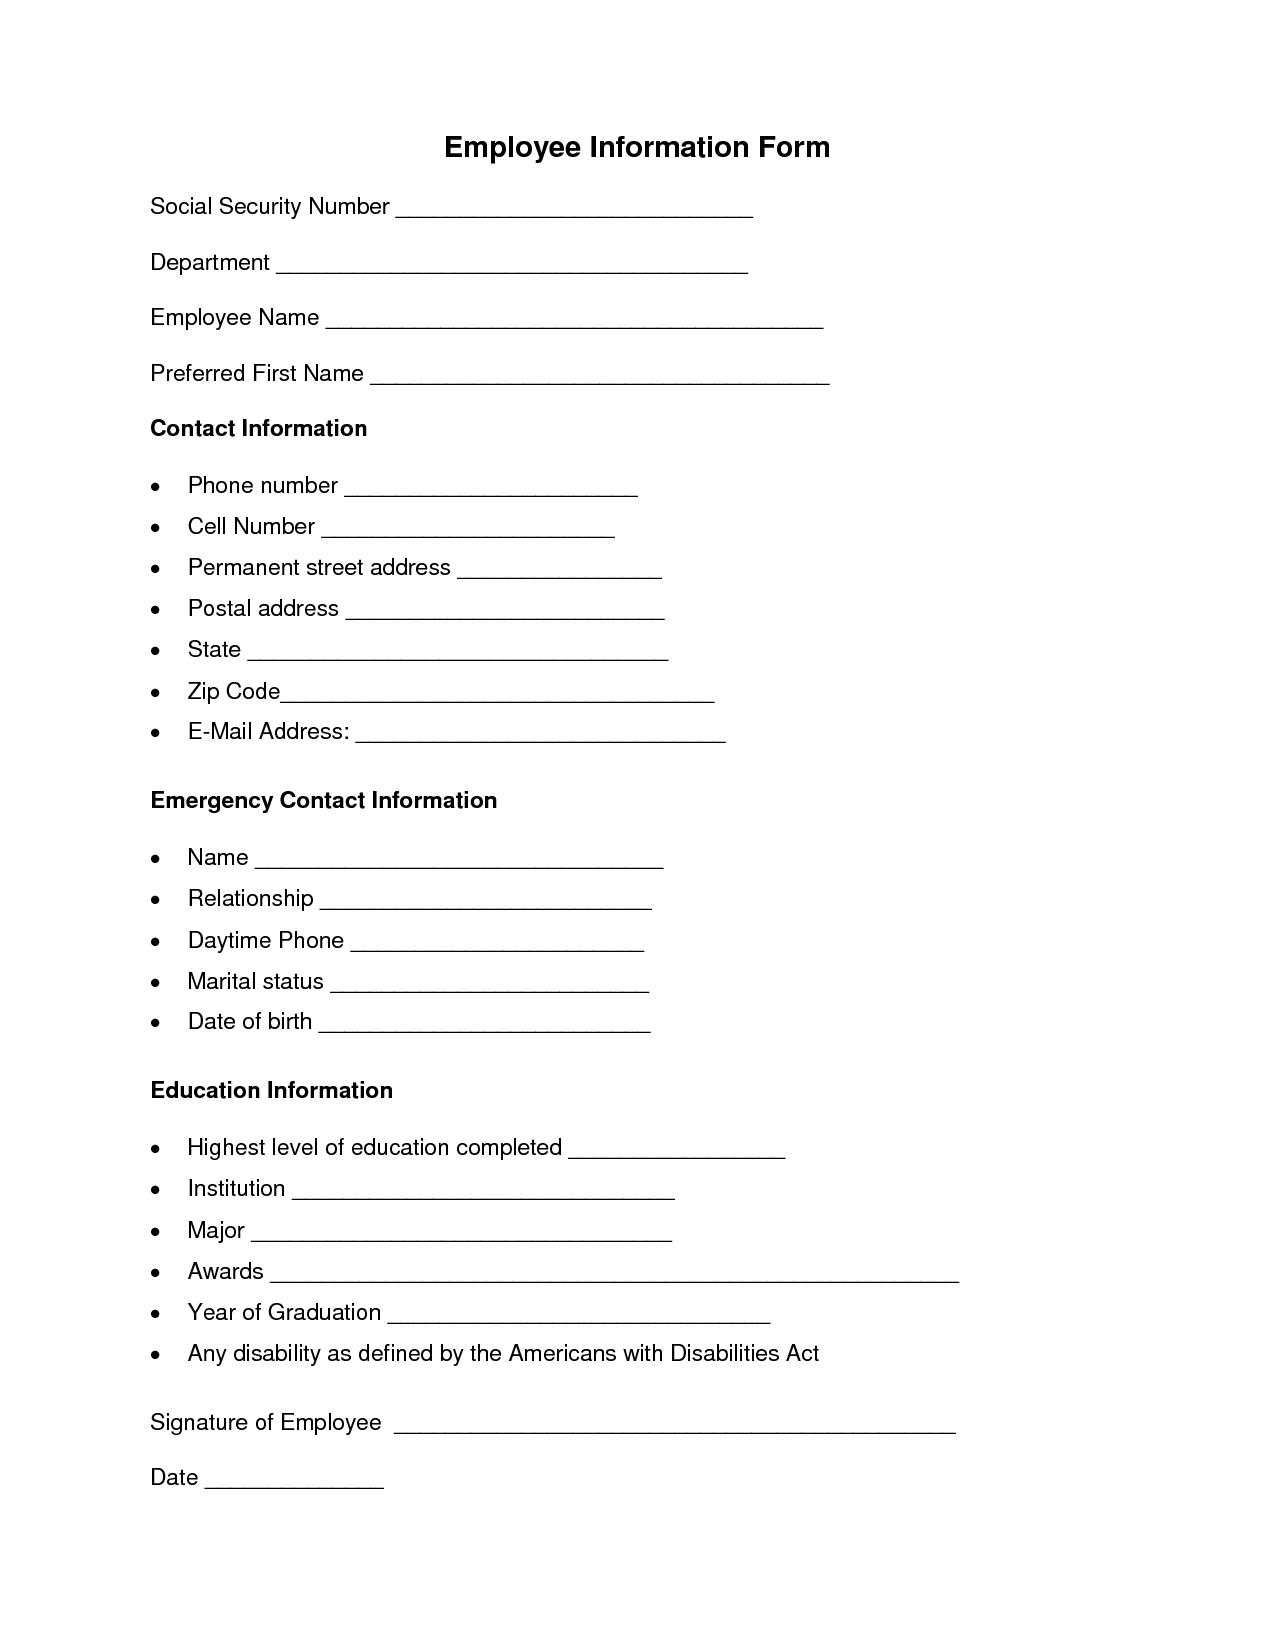 011 Employment Application Template Word Ideas Employee For Employment Application Template Microsoft Word